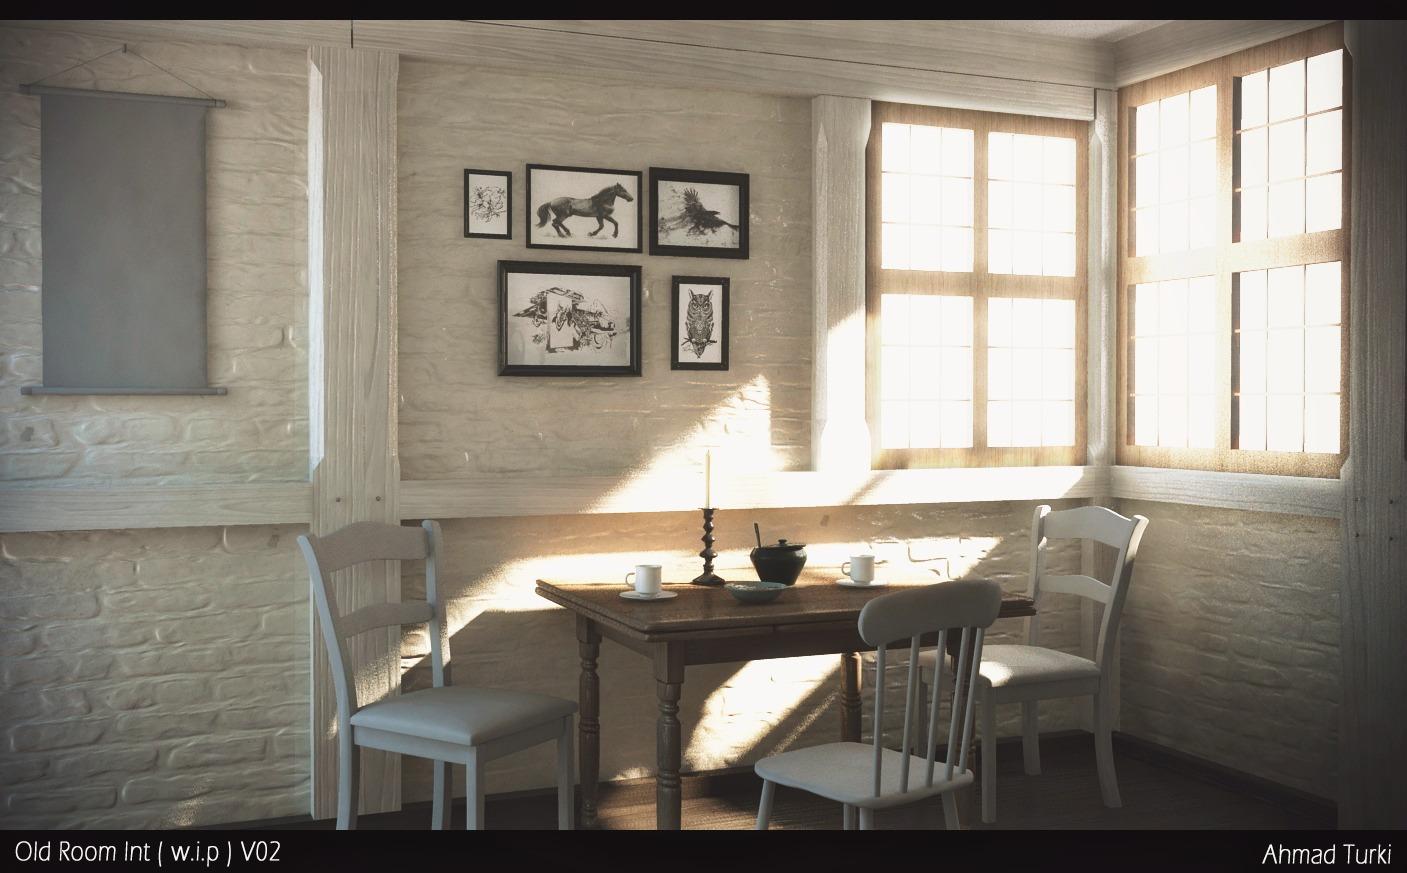 Old Room Interior WIP V02